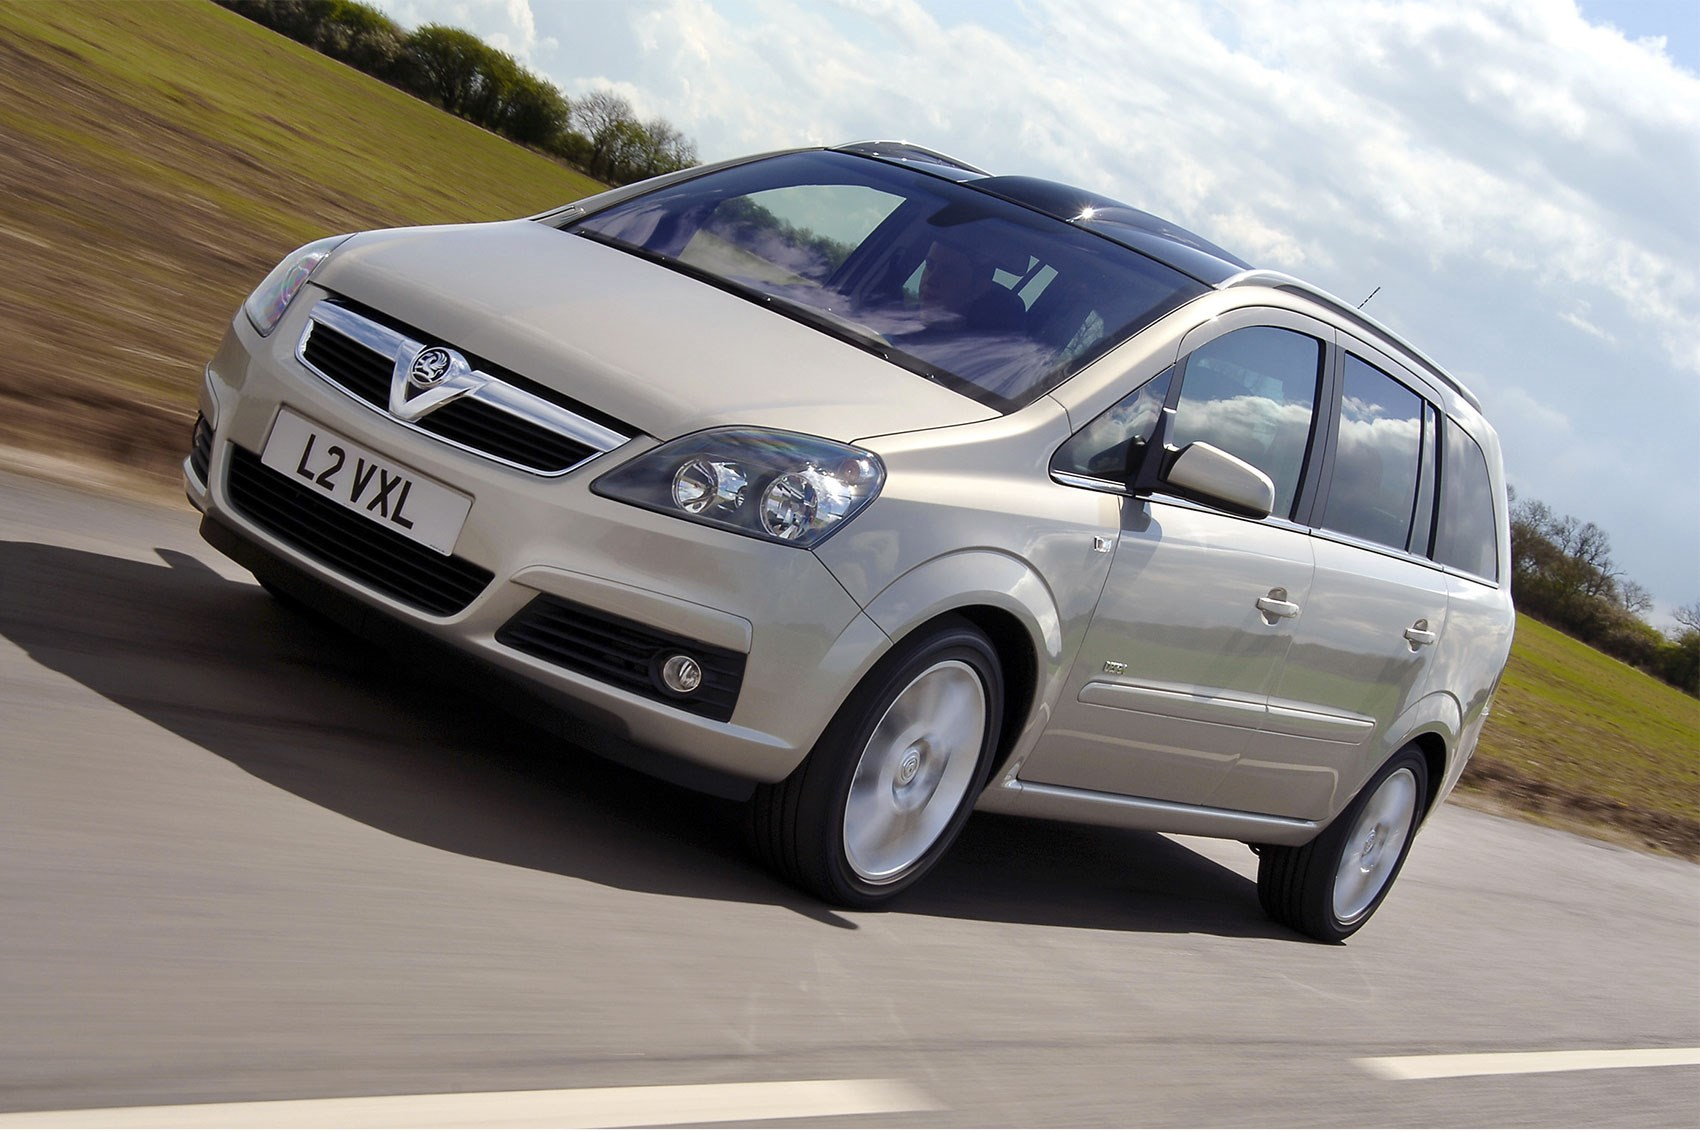 Vauxhall Zafira B fire risk explained